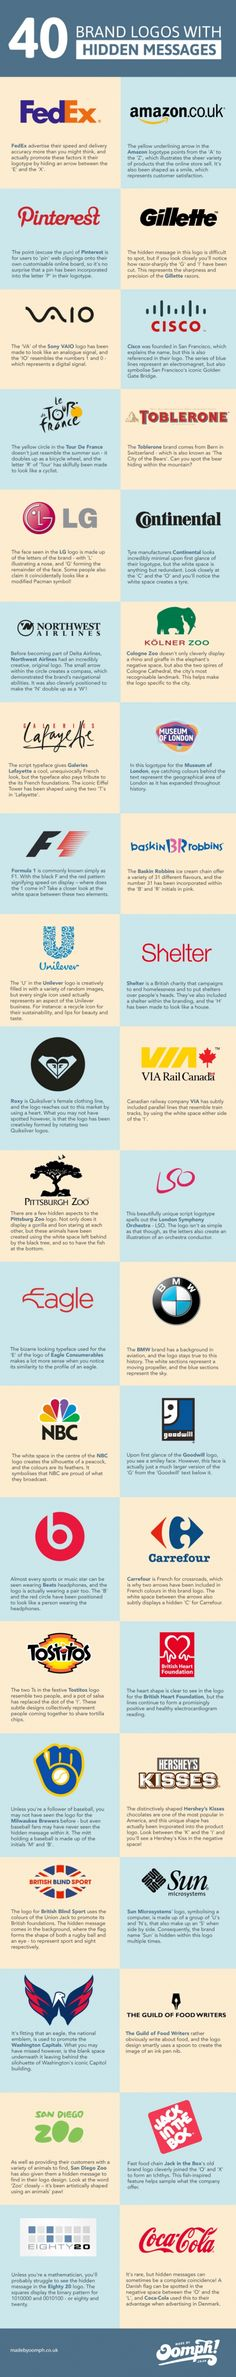 40 Logos With Hidden Messages